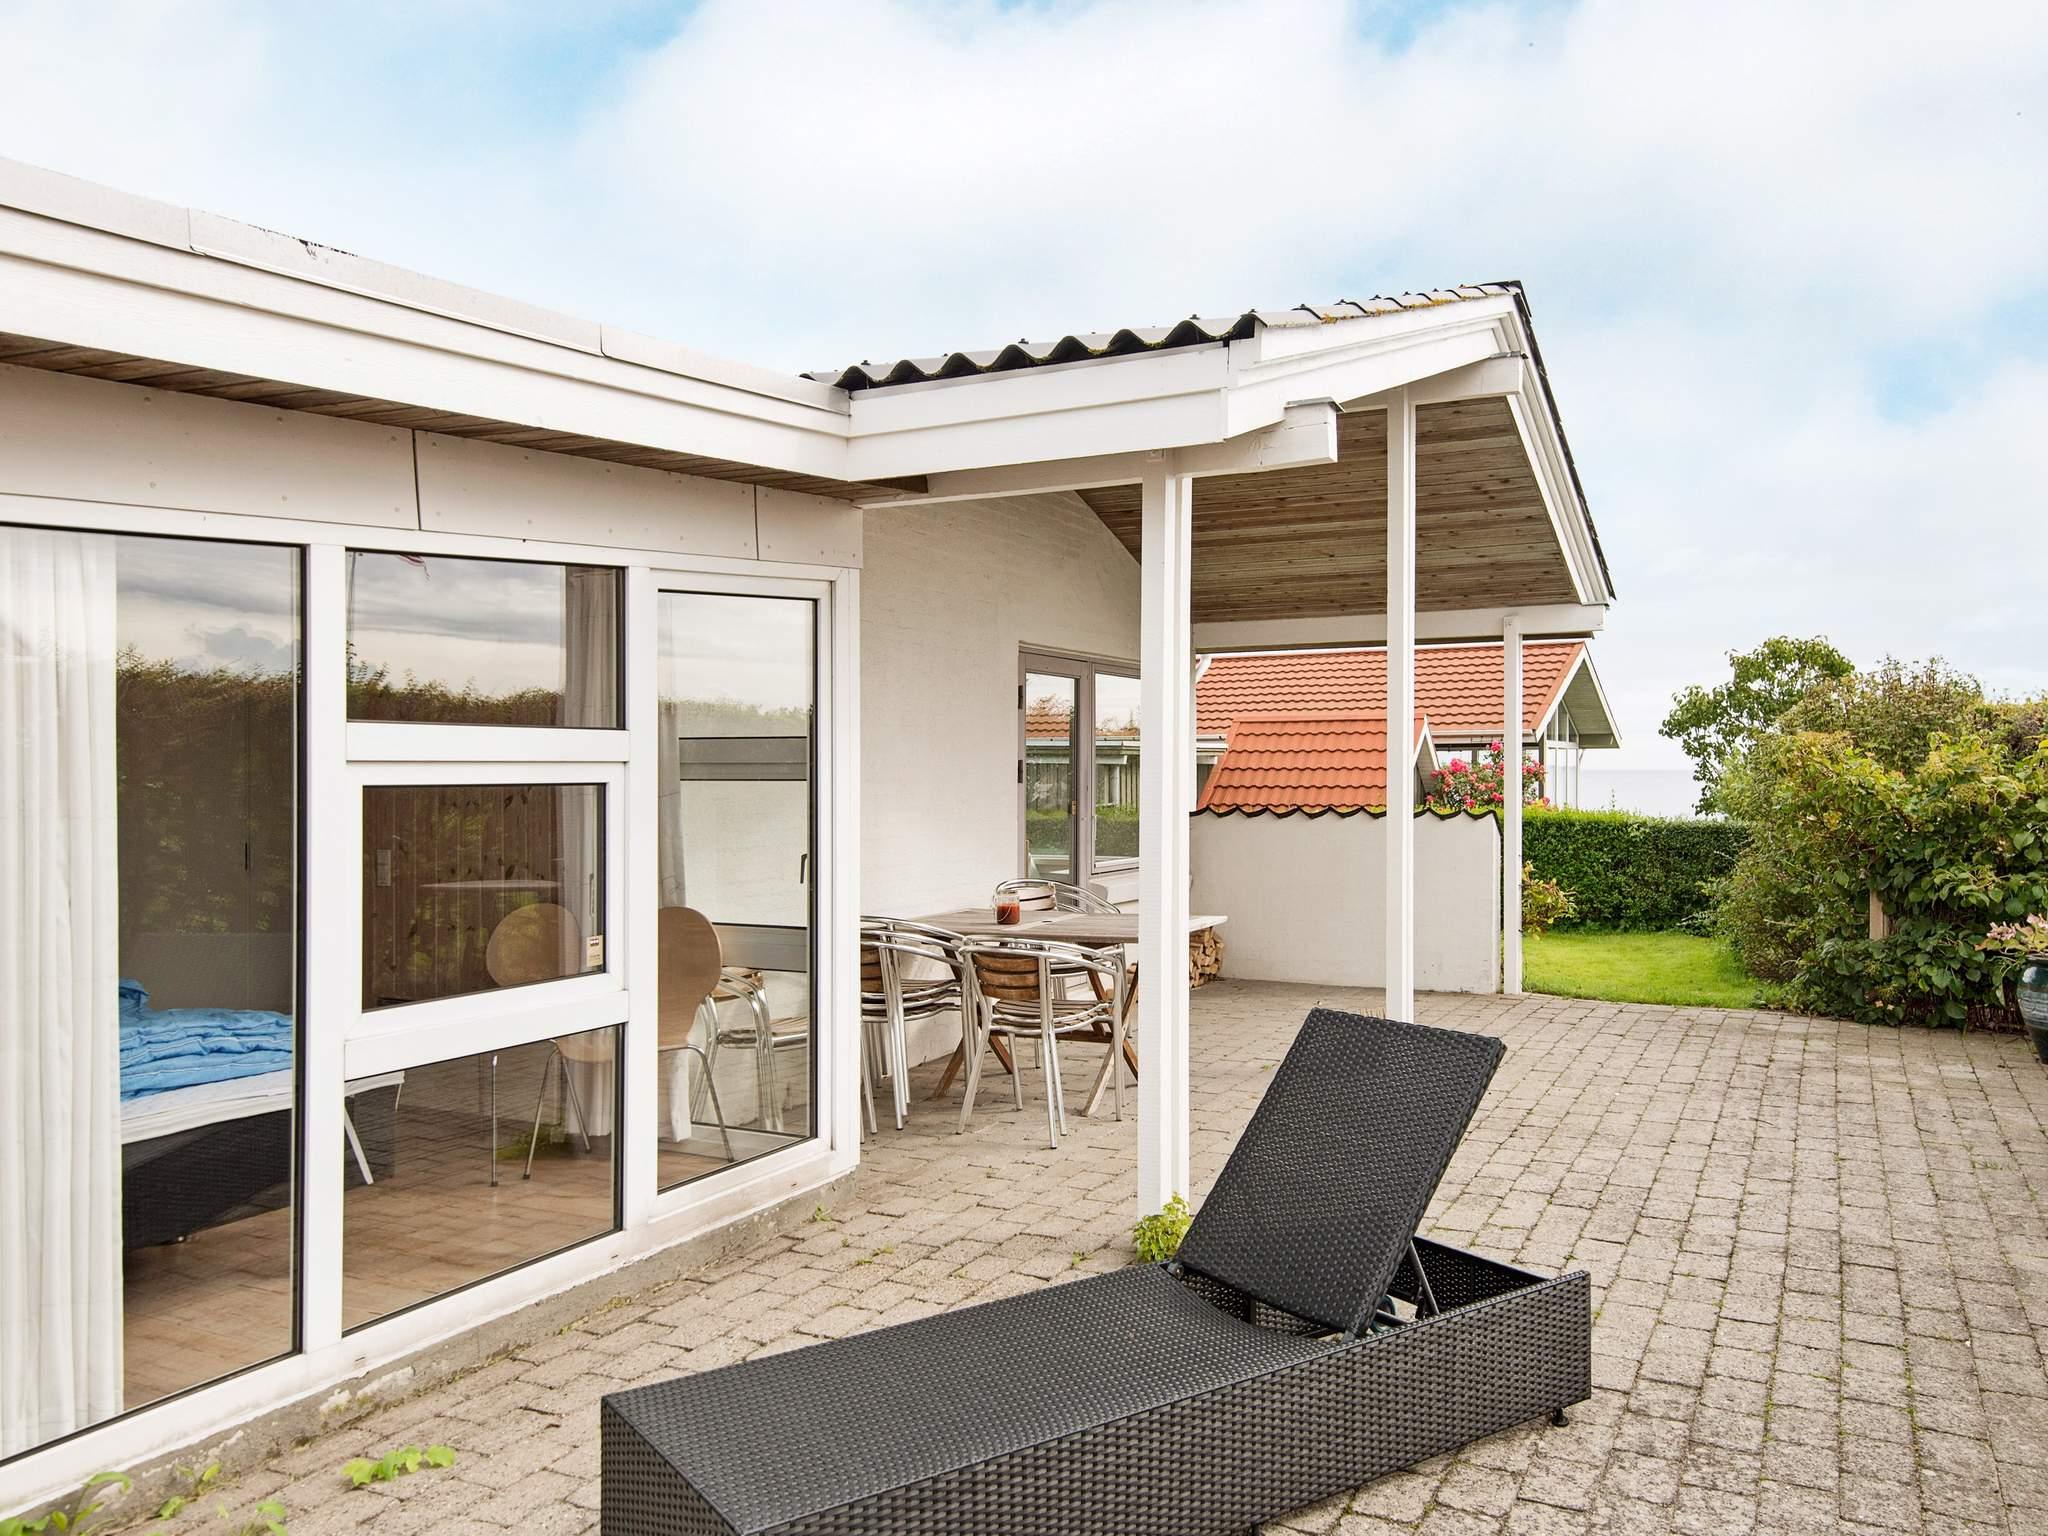 Ferienhaus Ajstrup Strand/Malling (2355032), Ajstrup, , Ostjütland, Dänemark, Bild 12